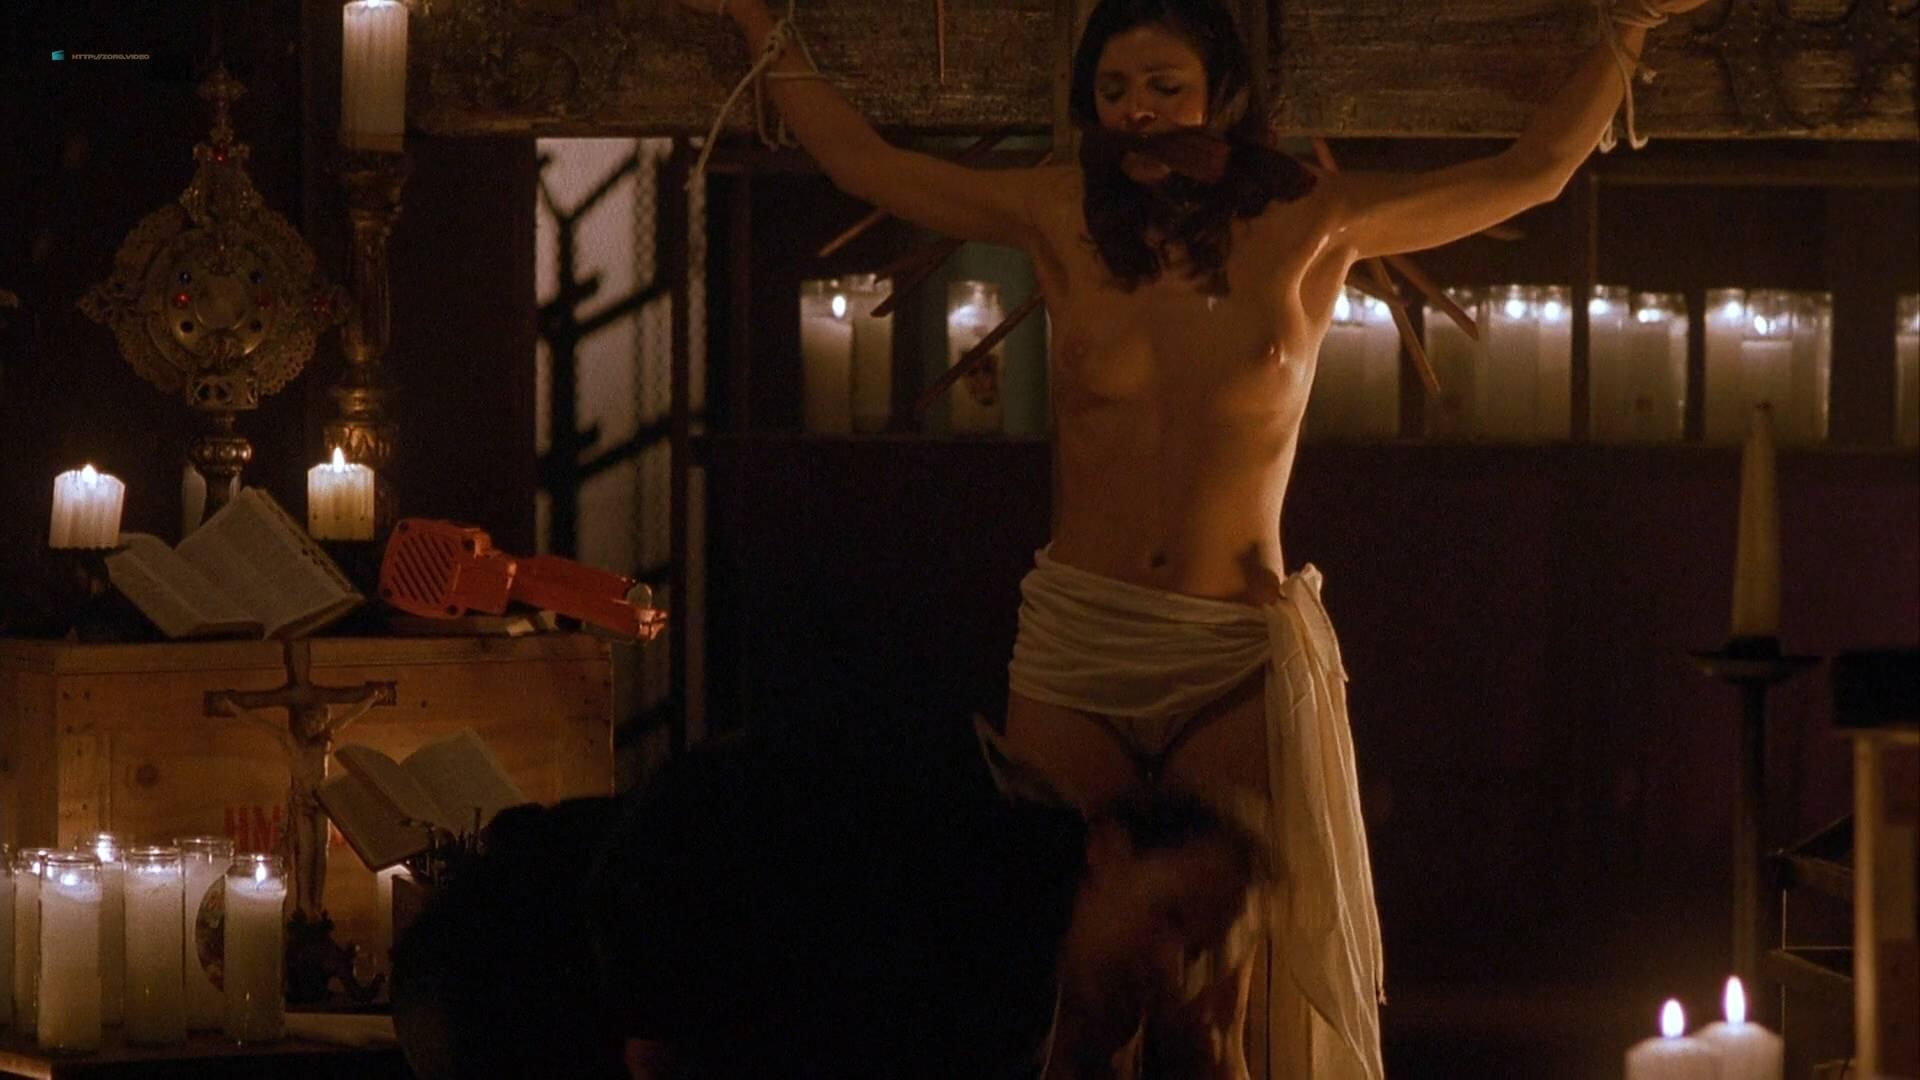 Alexandra Jimenez Tetas gladys jimenez nude topless and erynn dana dalton nude too